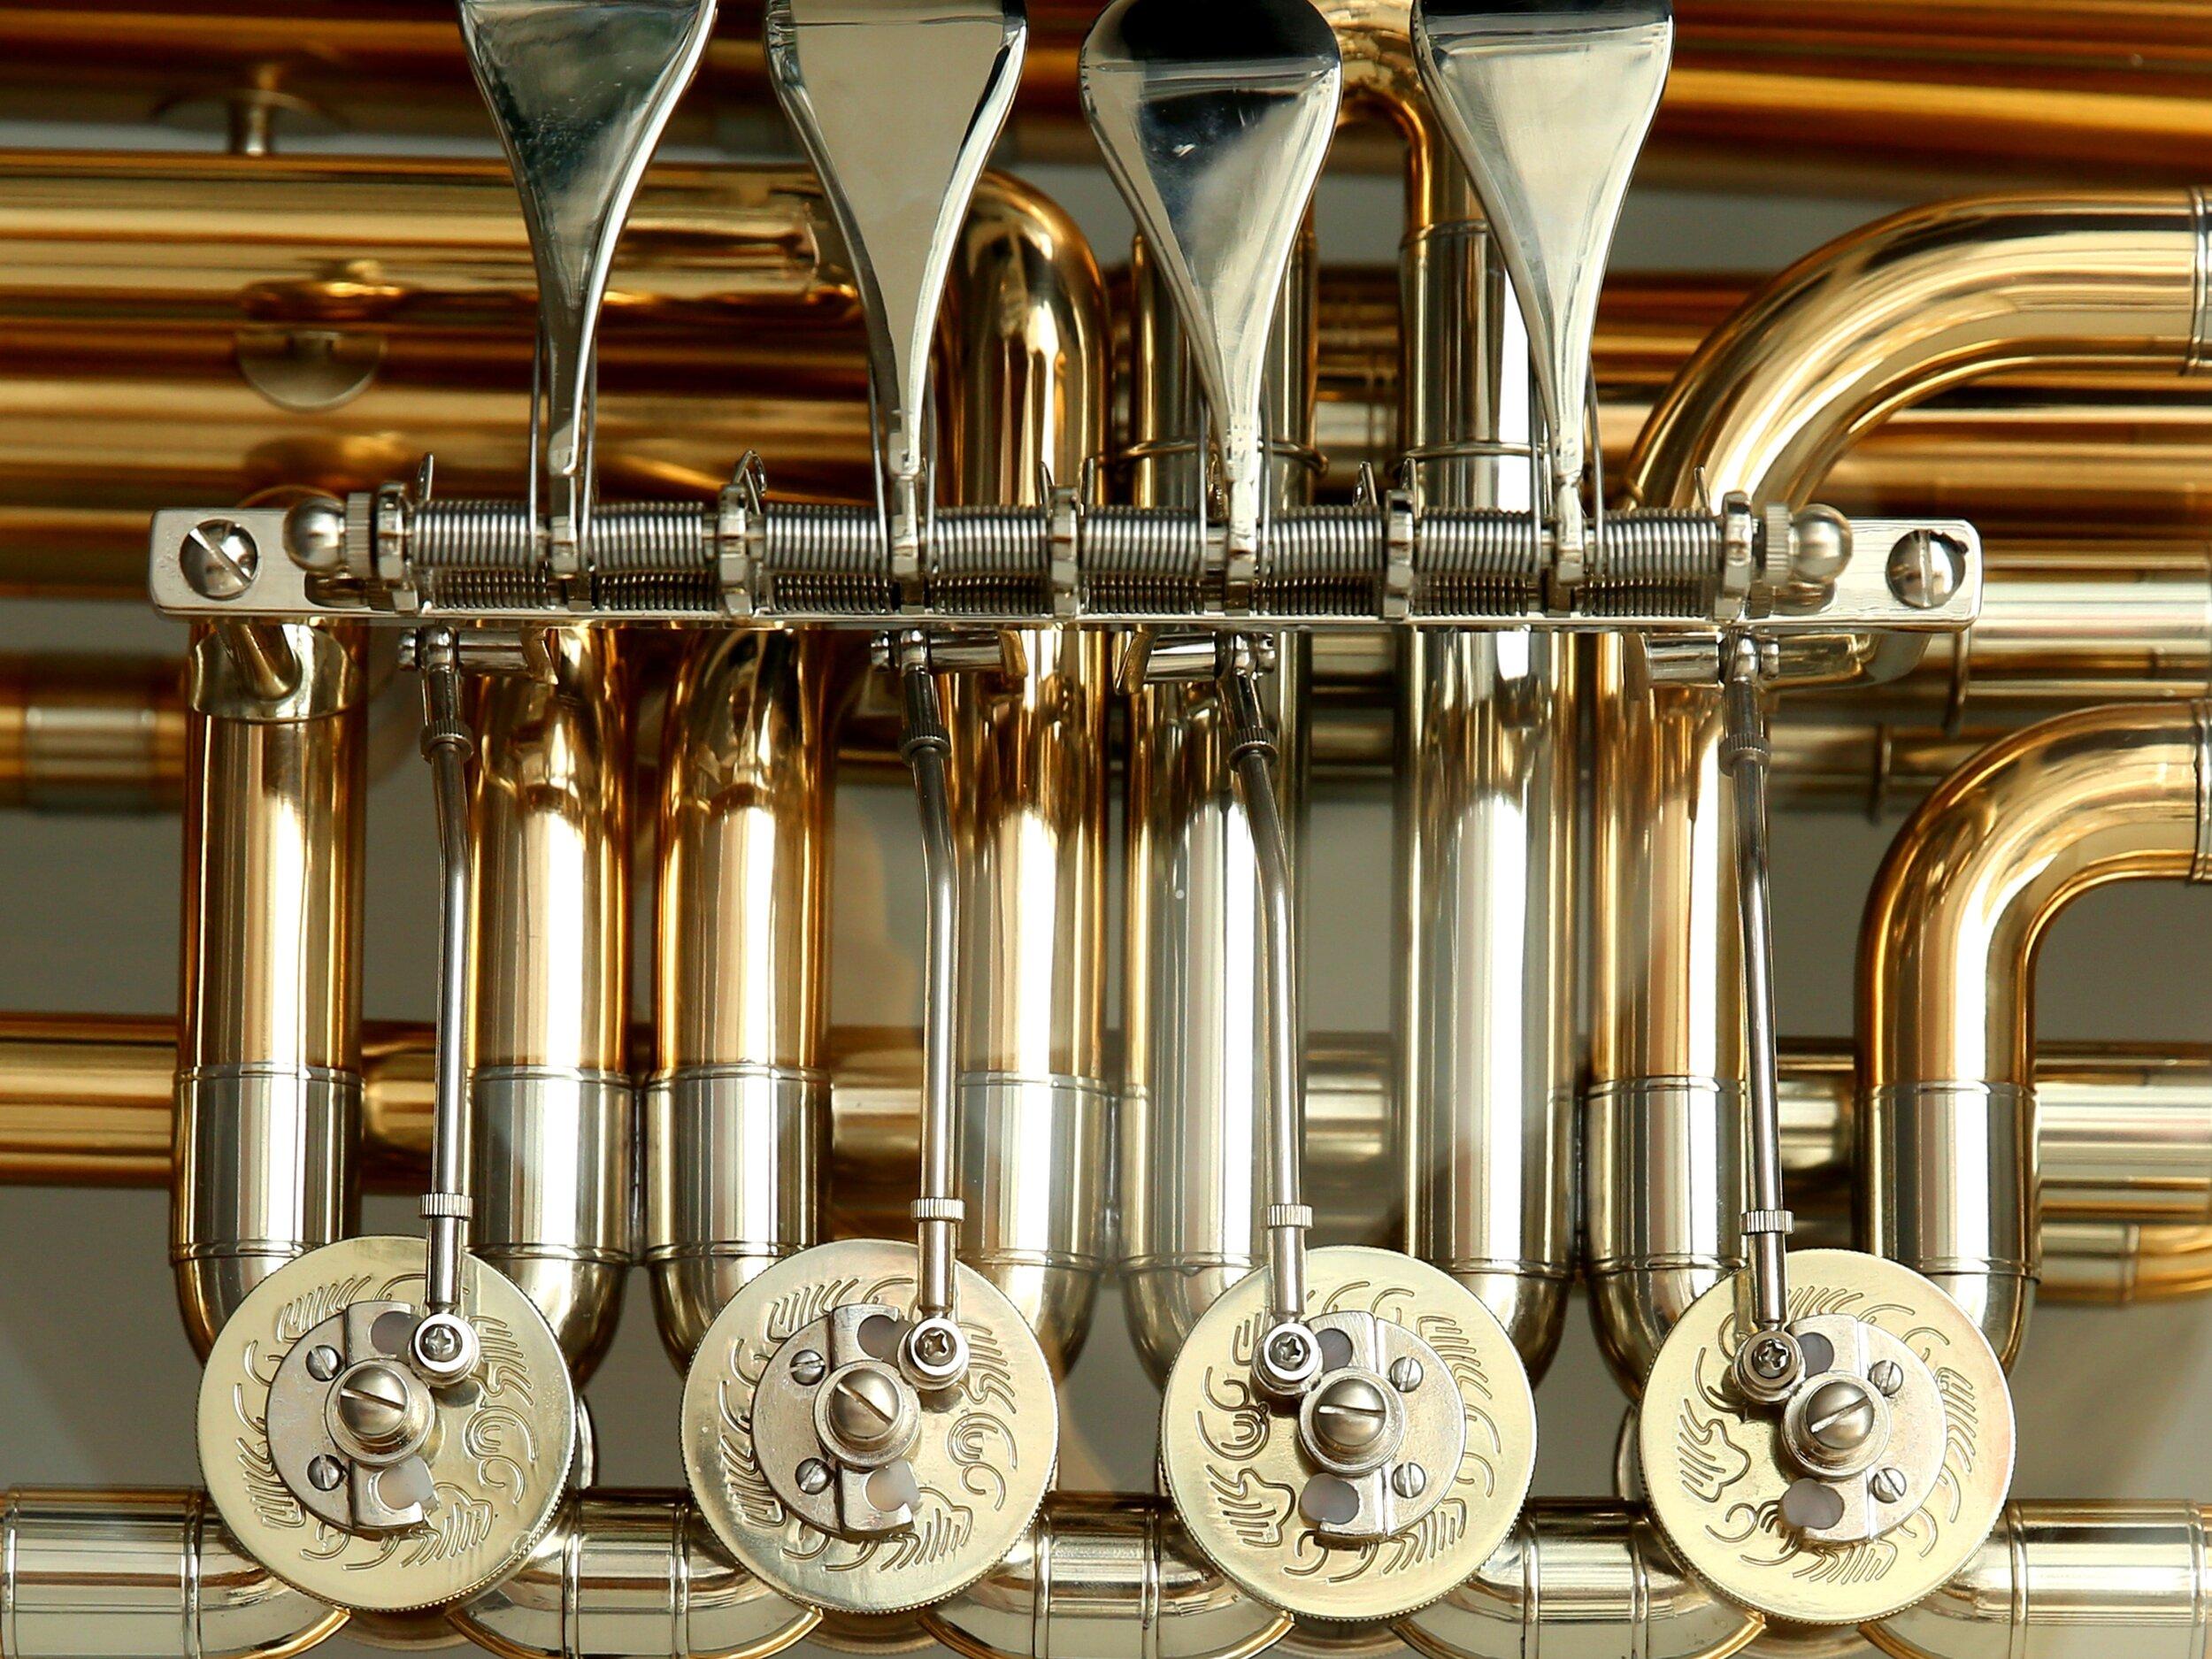 brass-brass-instrument-detail-51932.jpg